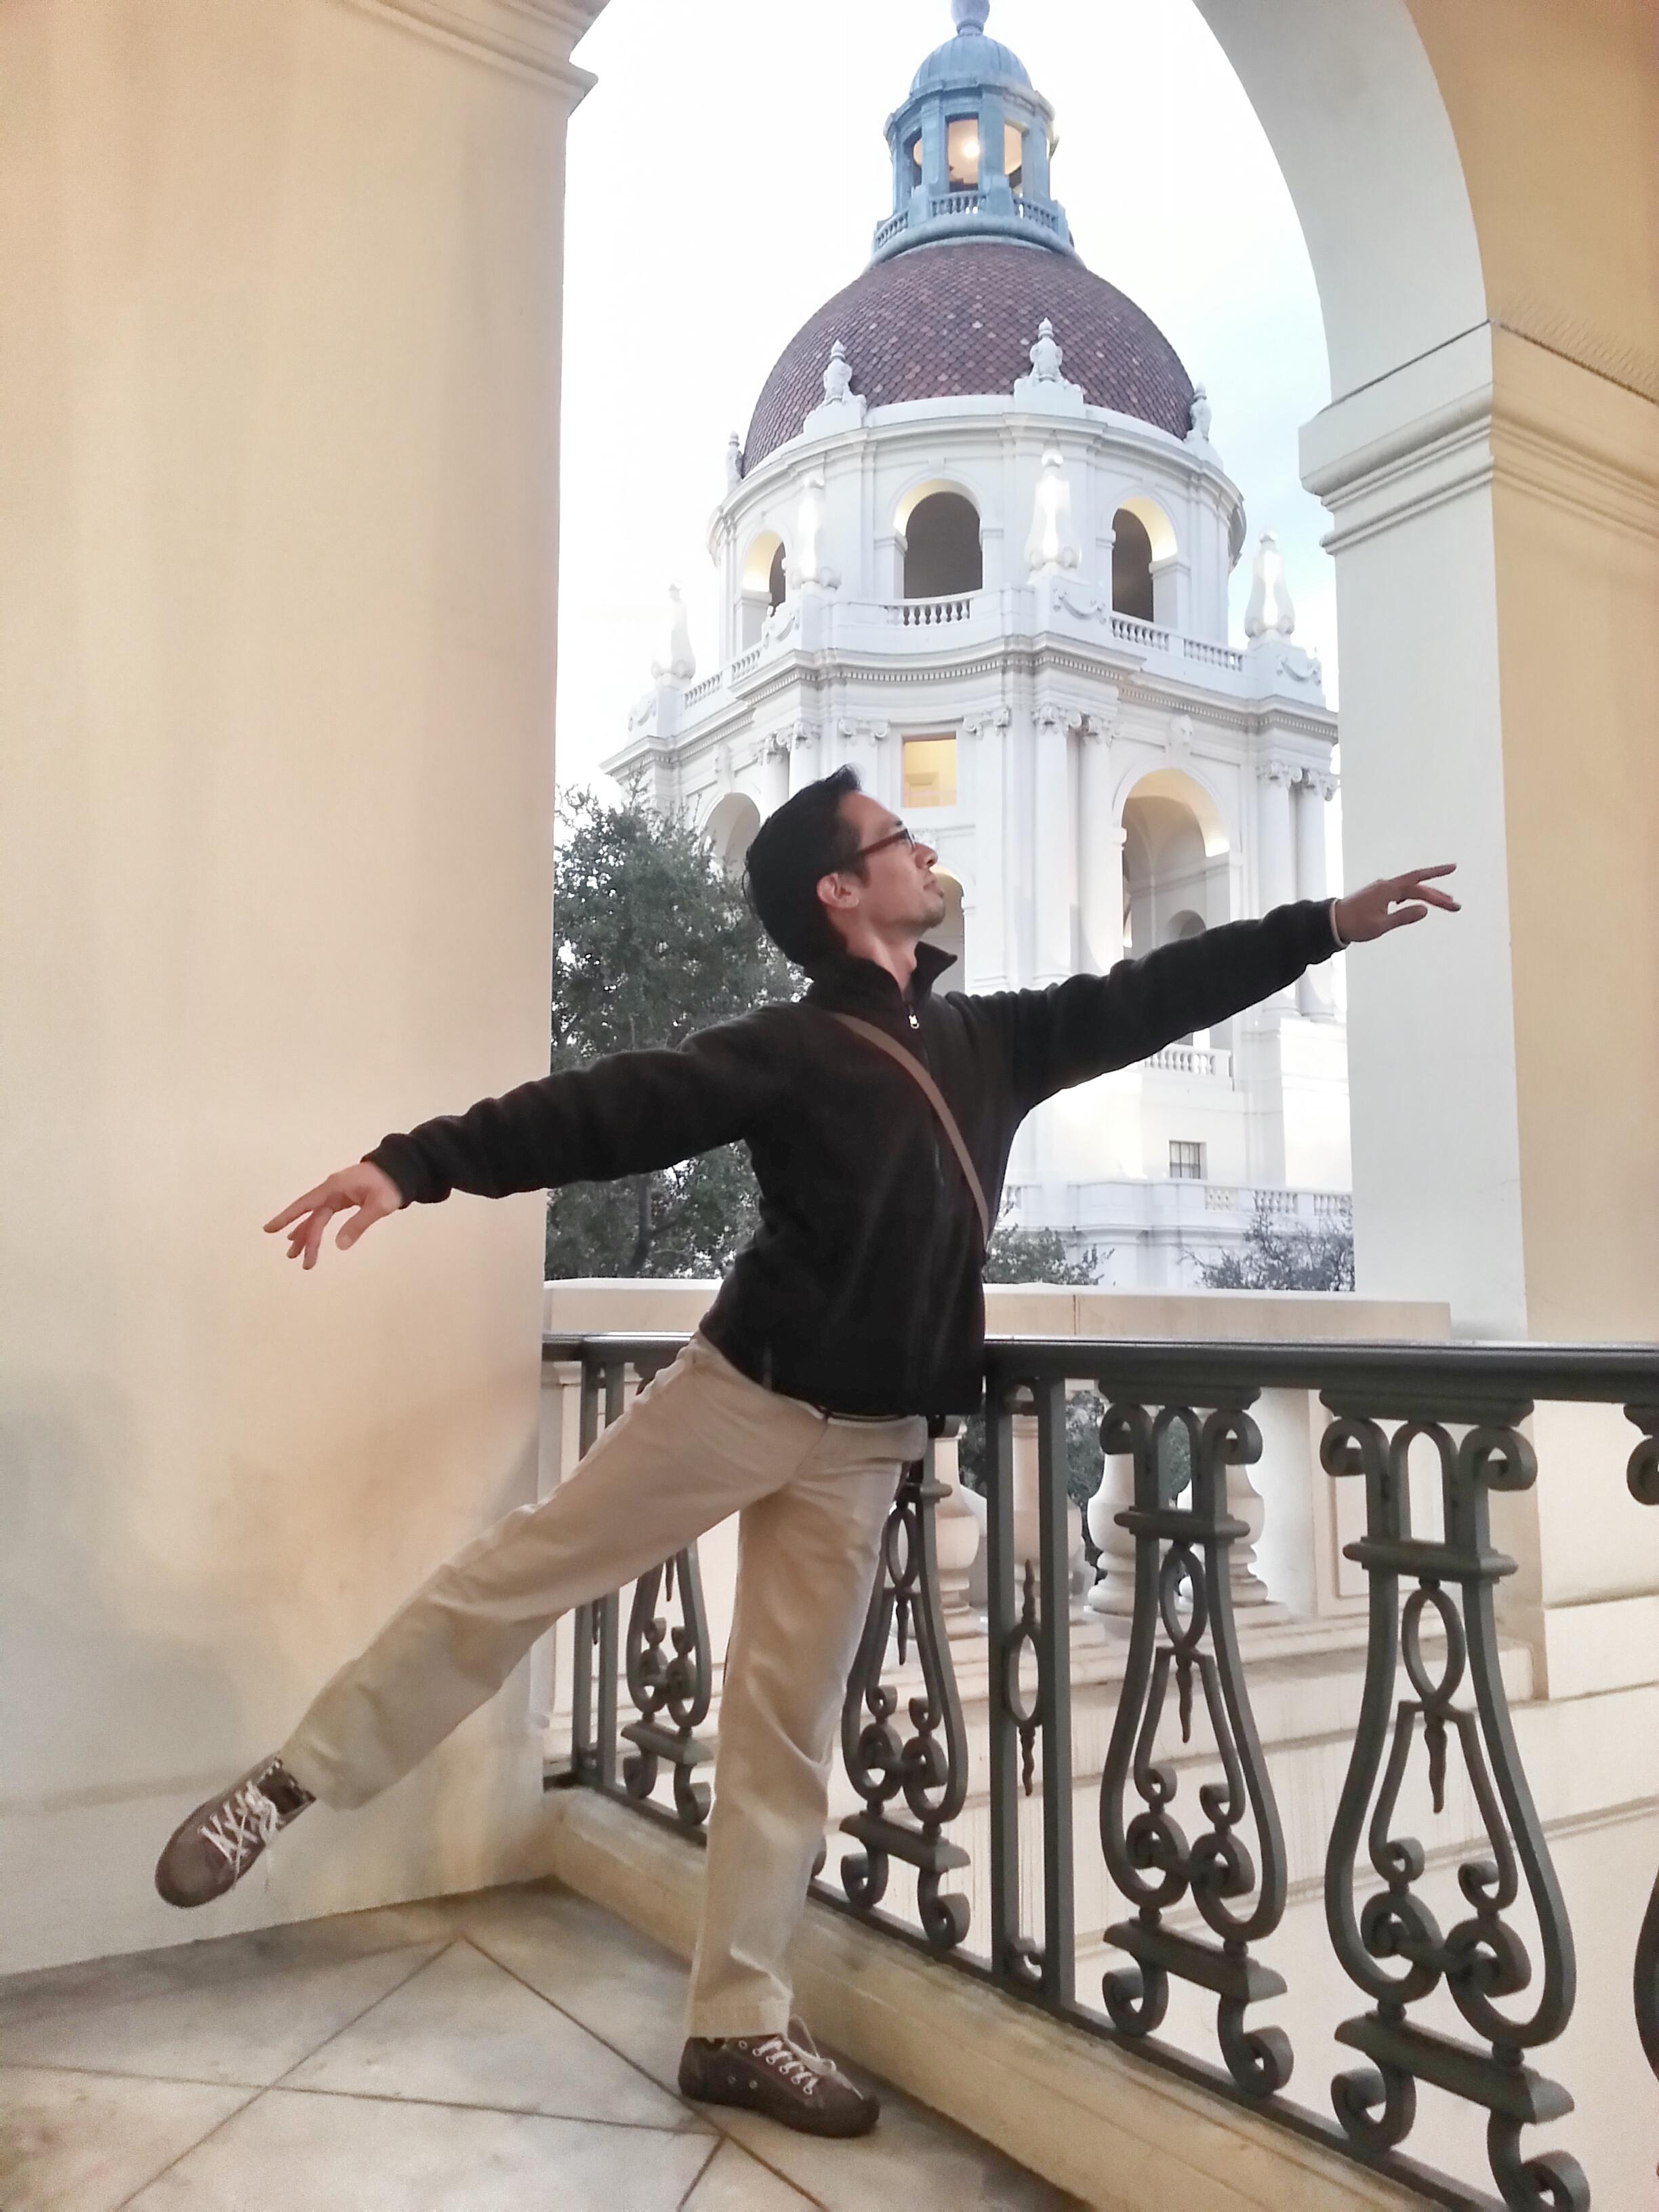 Arabesque at City Hall in Pasadena, California.